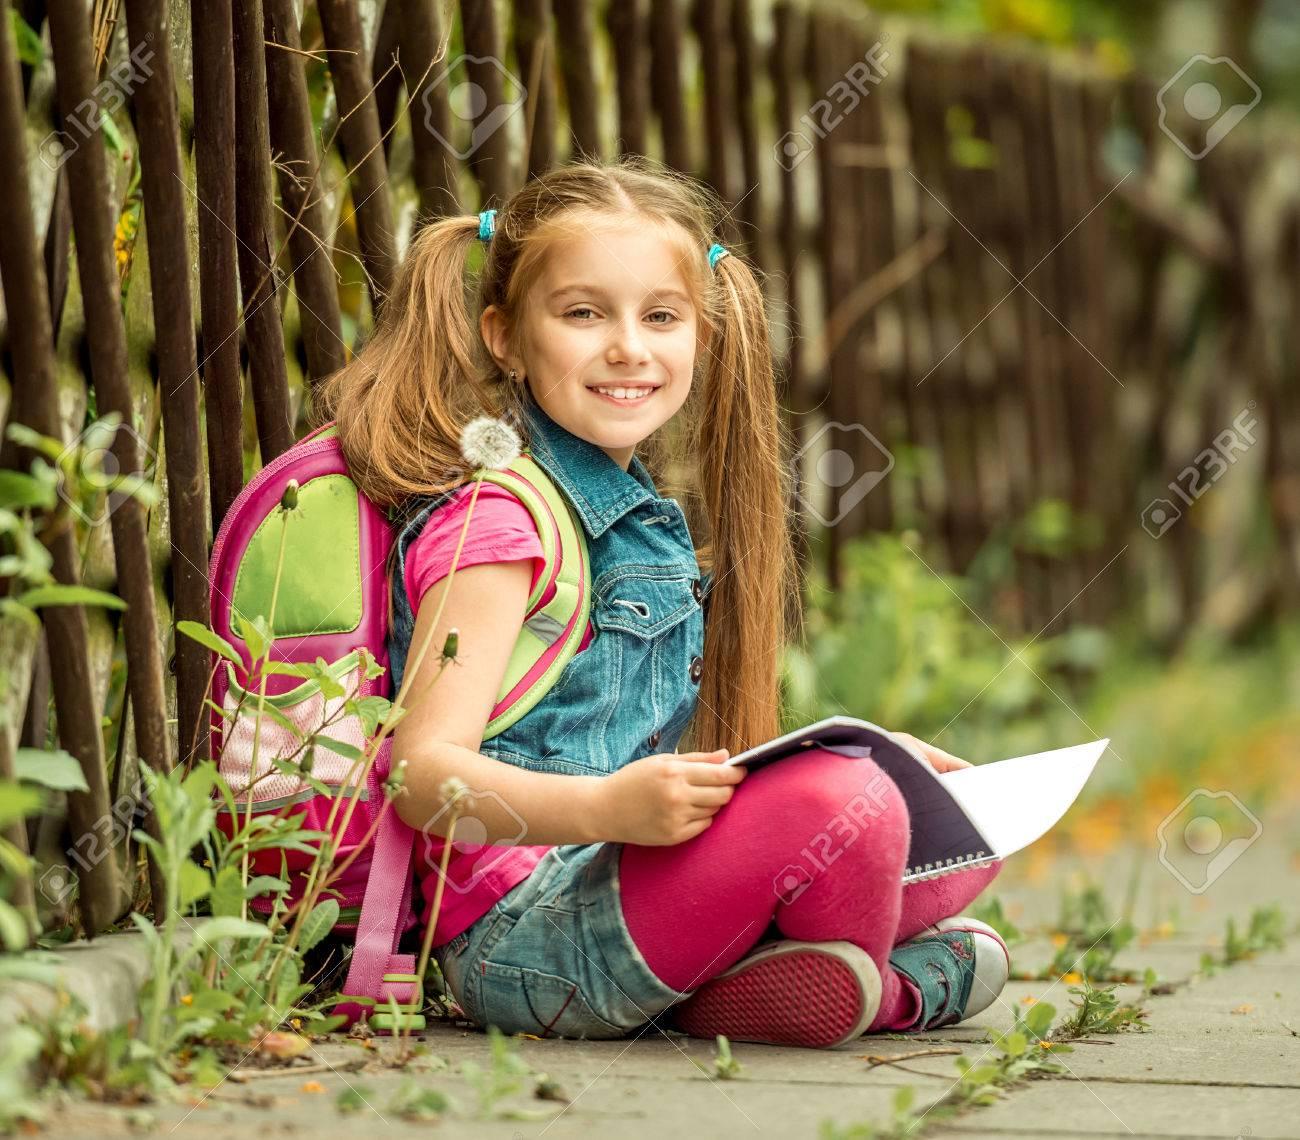 Little pretty schoolgirl reading a book sitting on the street - 40854476